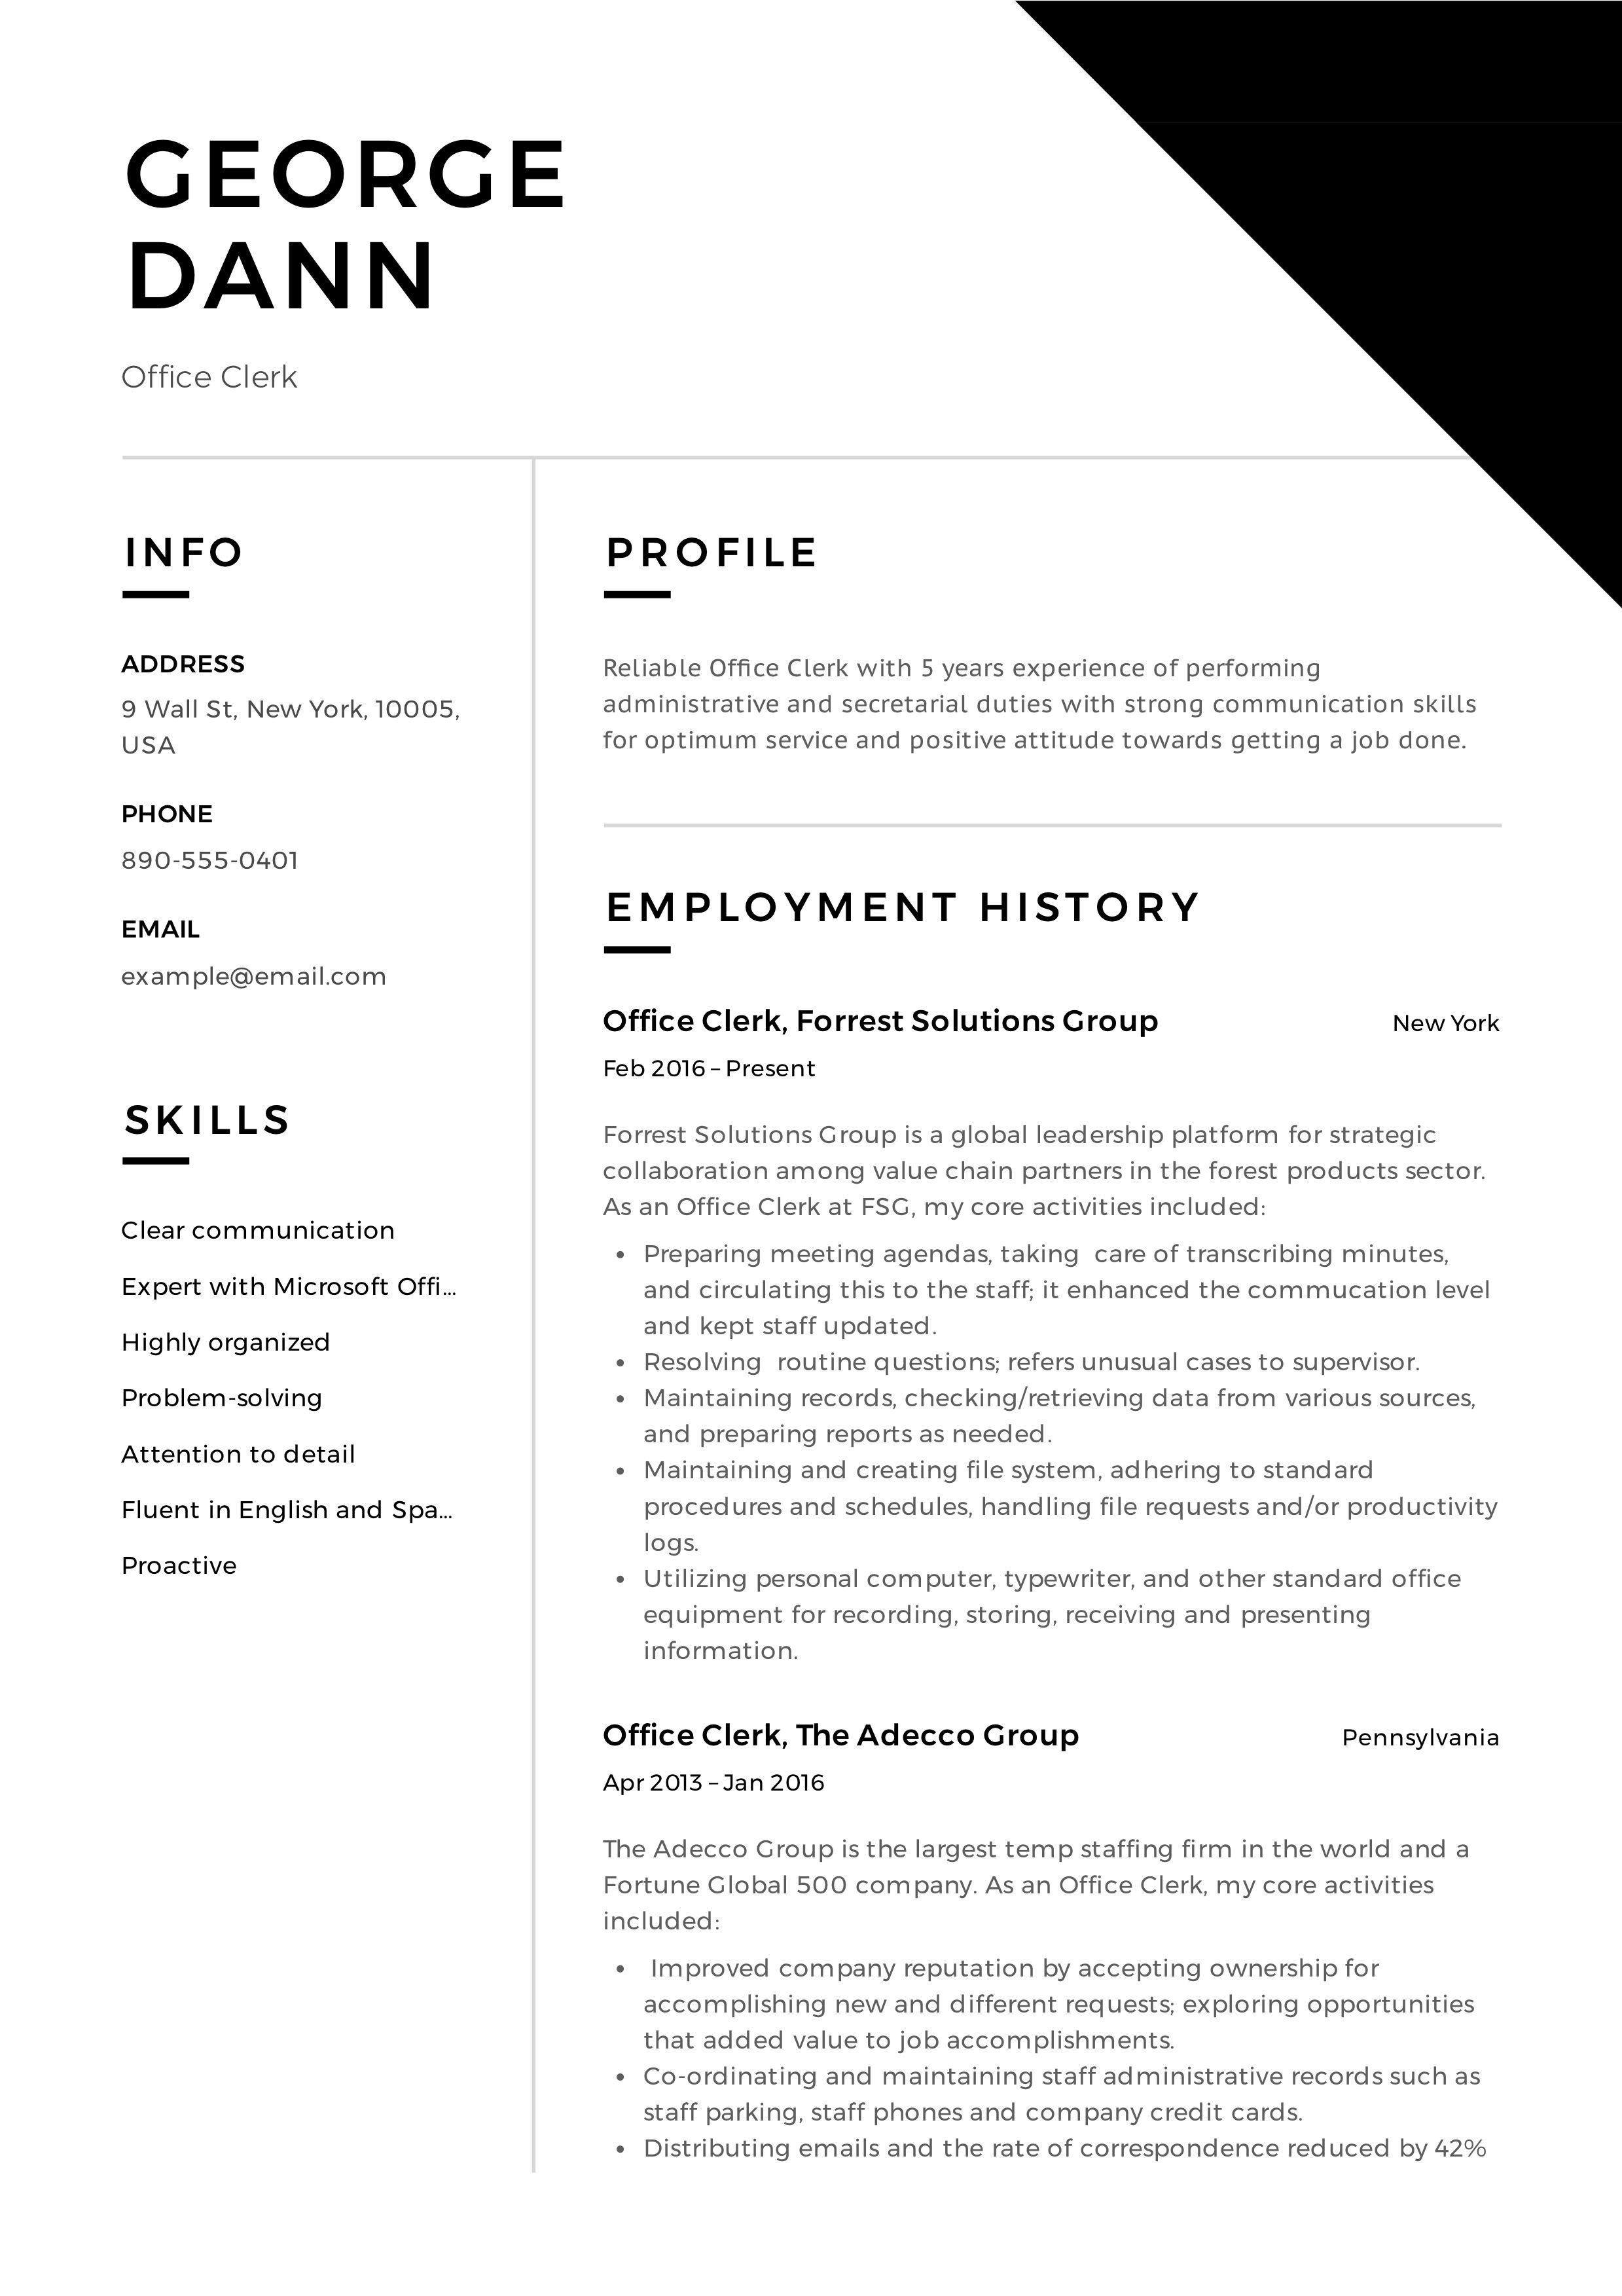 Office Clerk Resume Guide Resume Examples Resume Guide